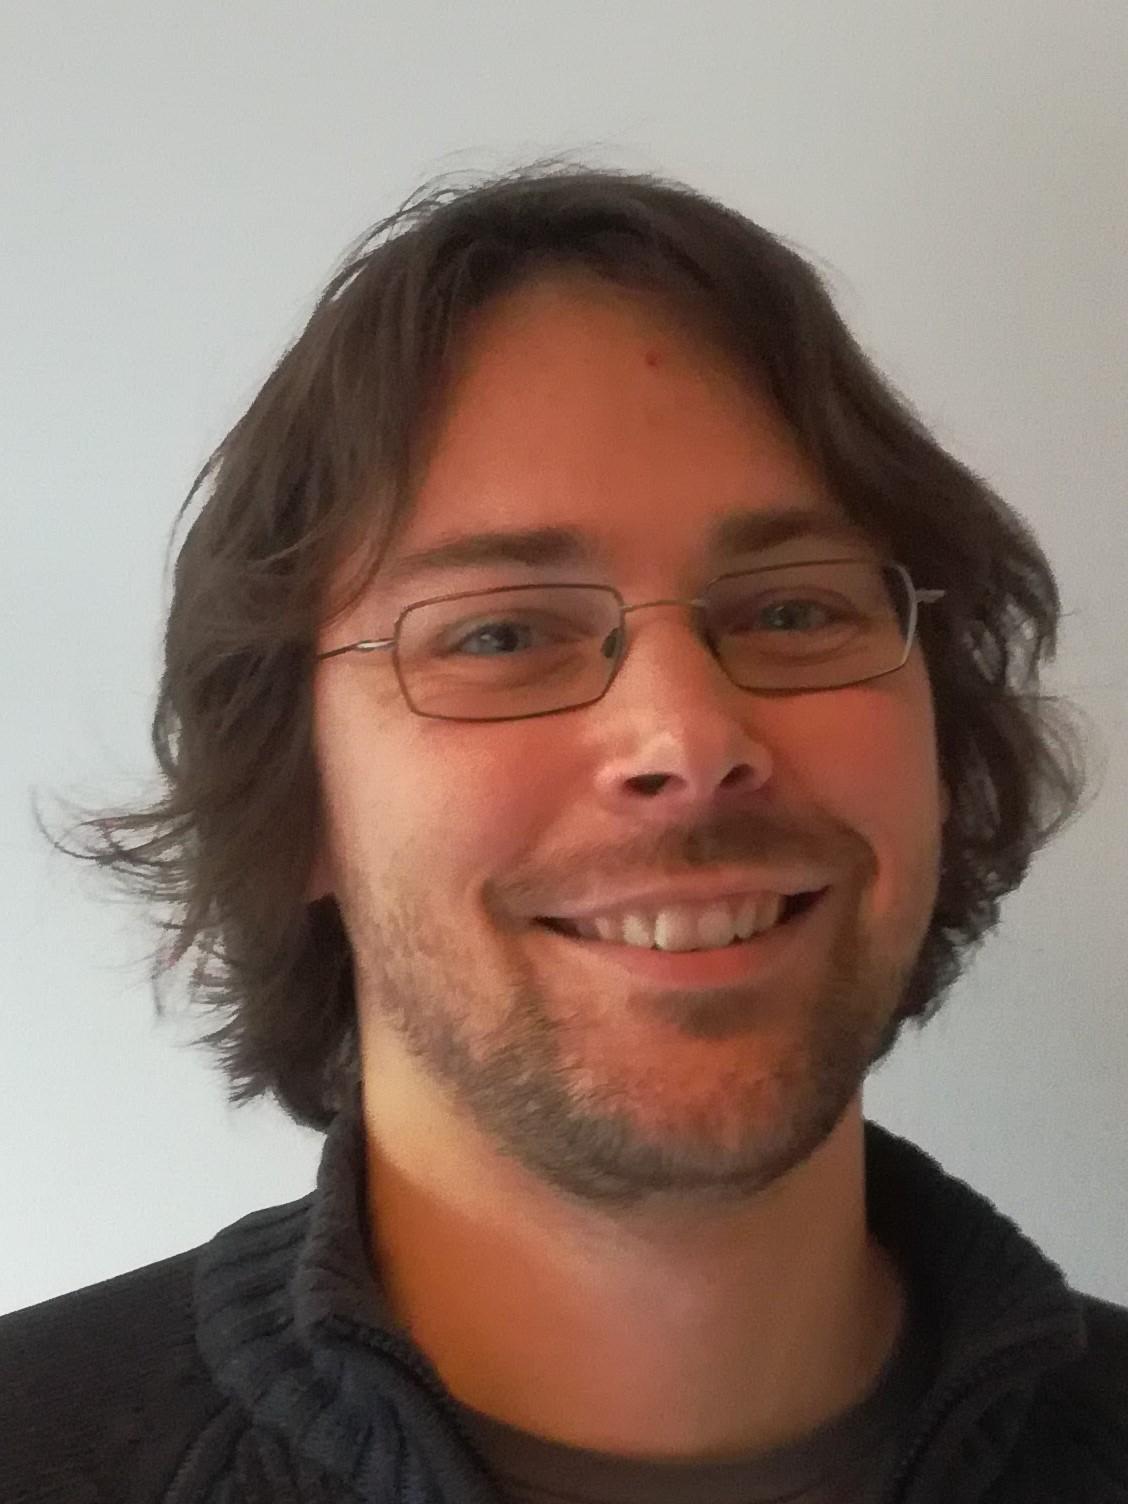 Adam Kučera